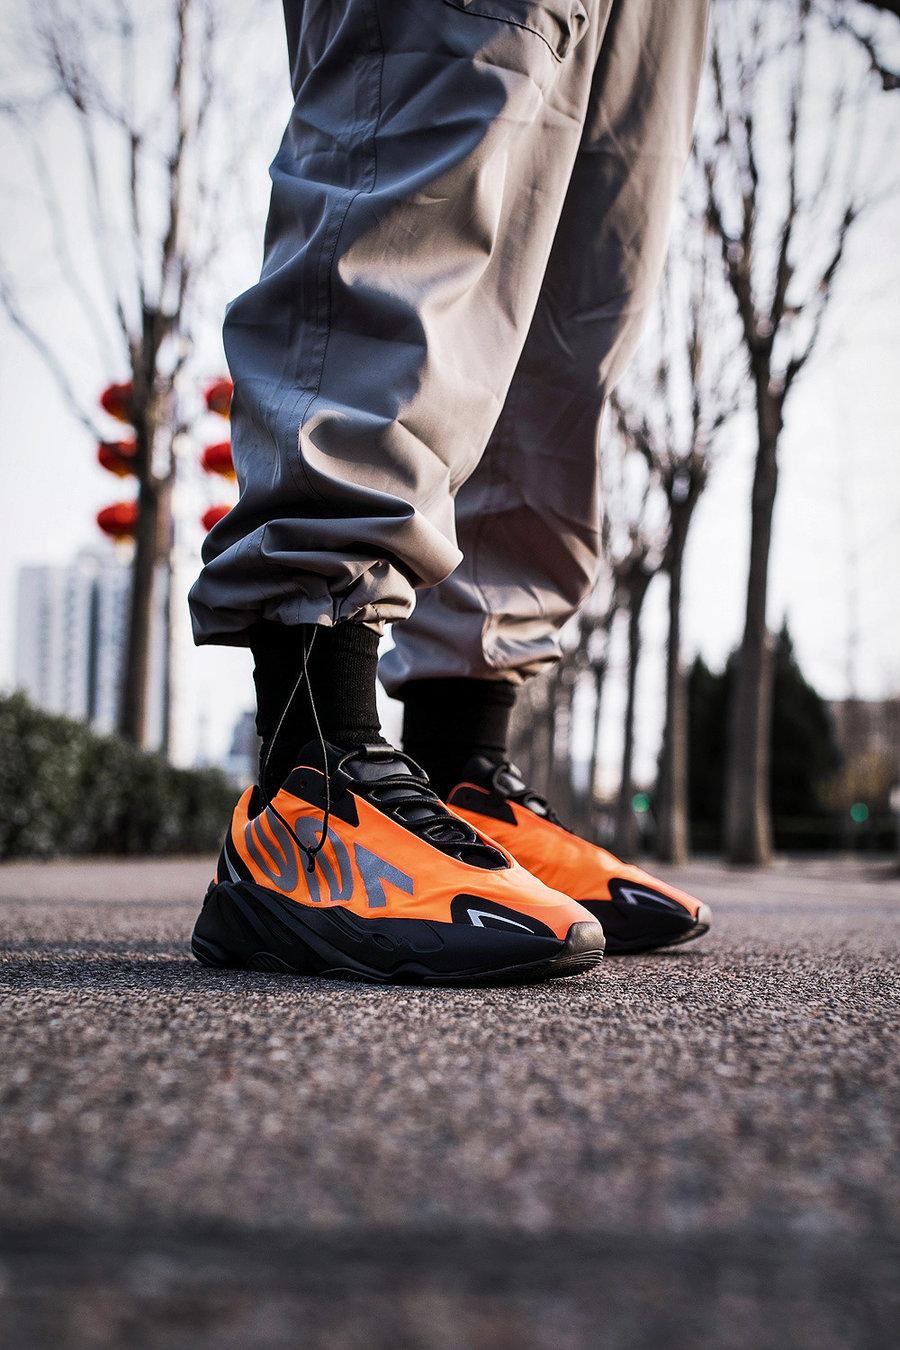 AJ1,Air Jordan 1,Yeezy 700  本周末 4 雙限量球鞋新品,在這個特殊時期的行情如何?